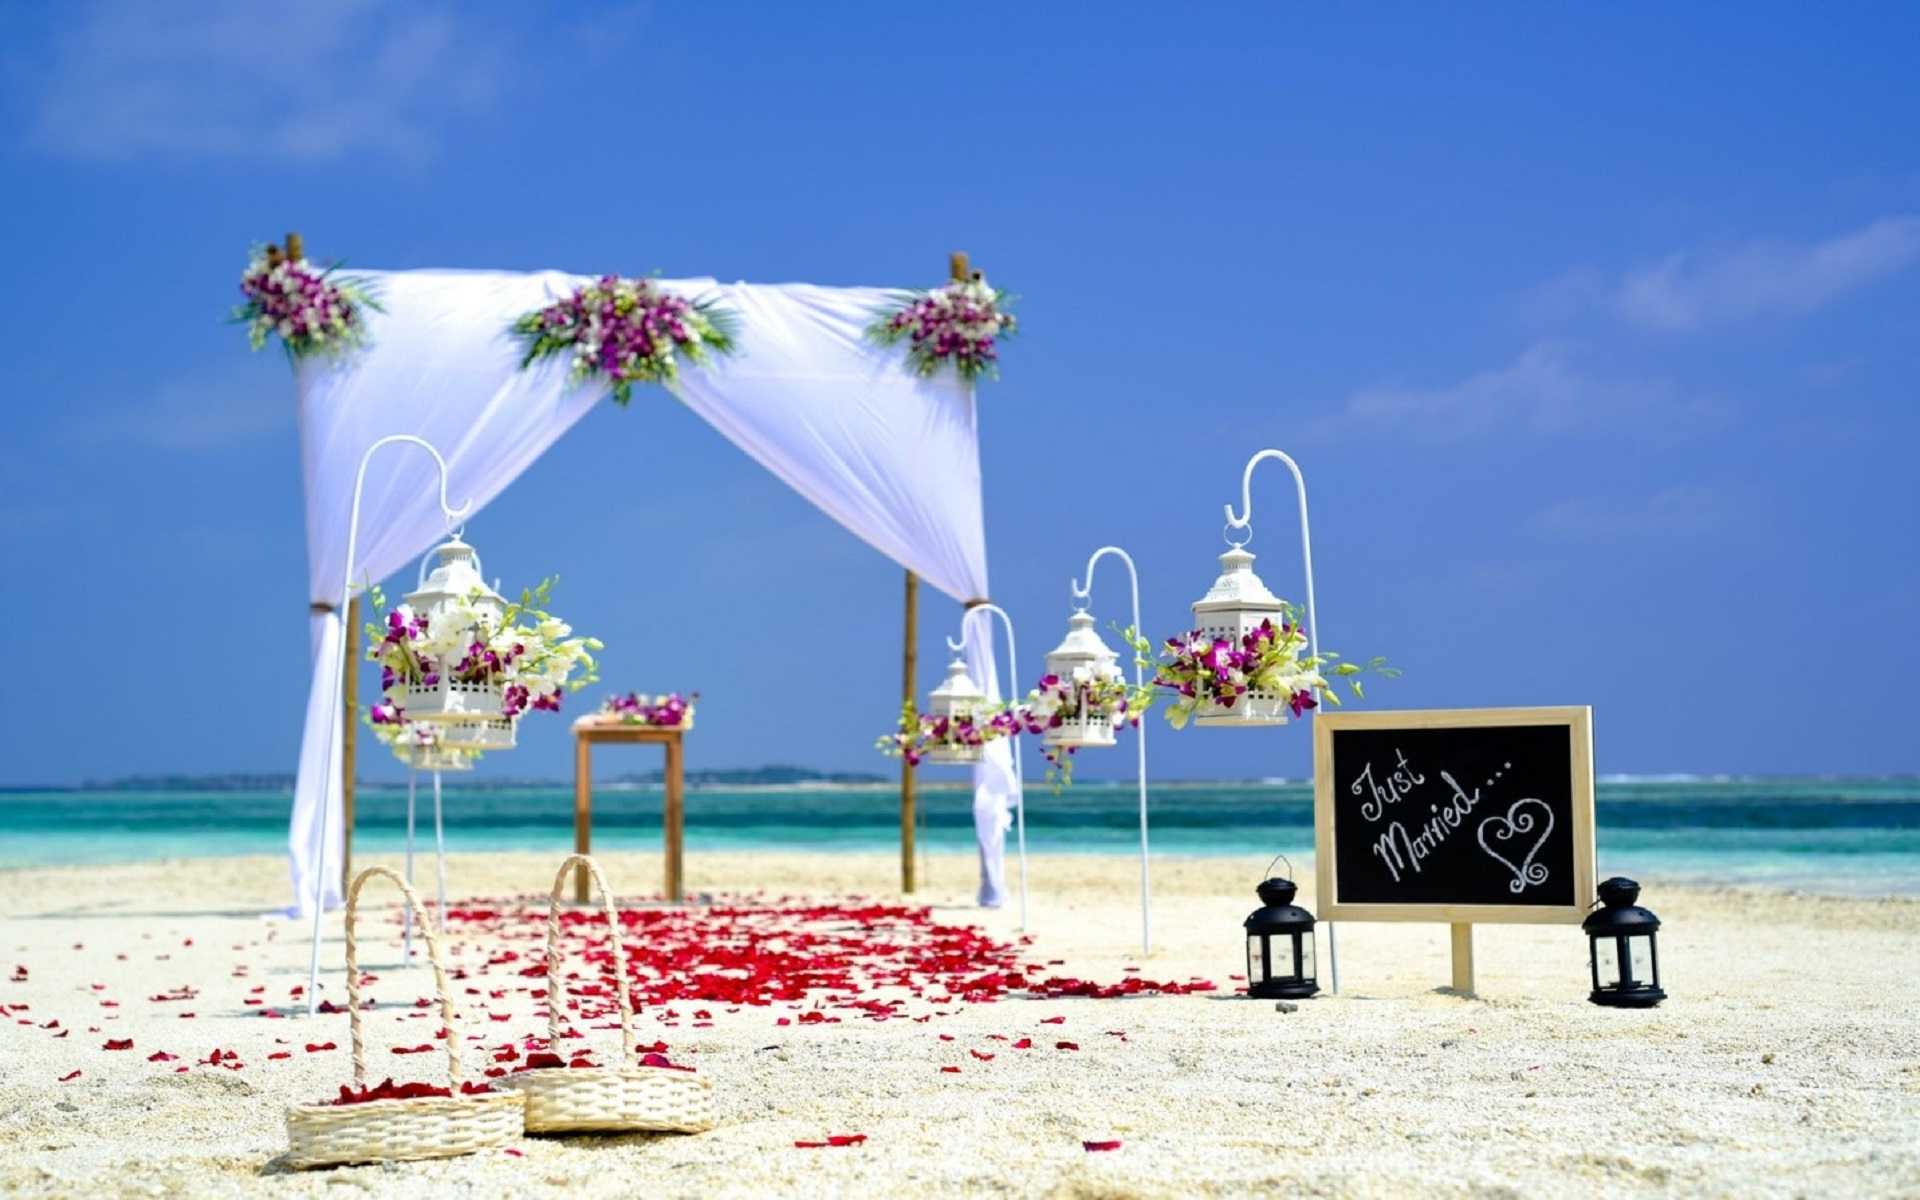 Theme-Based Wedding